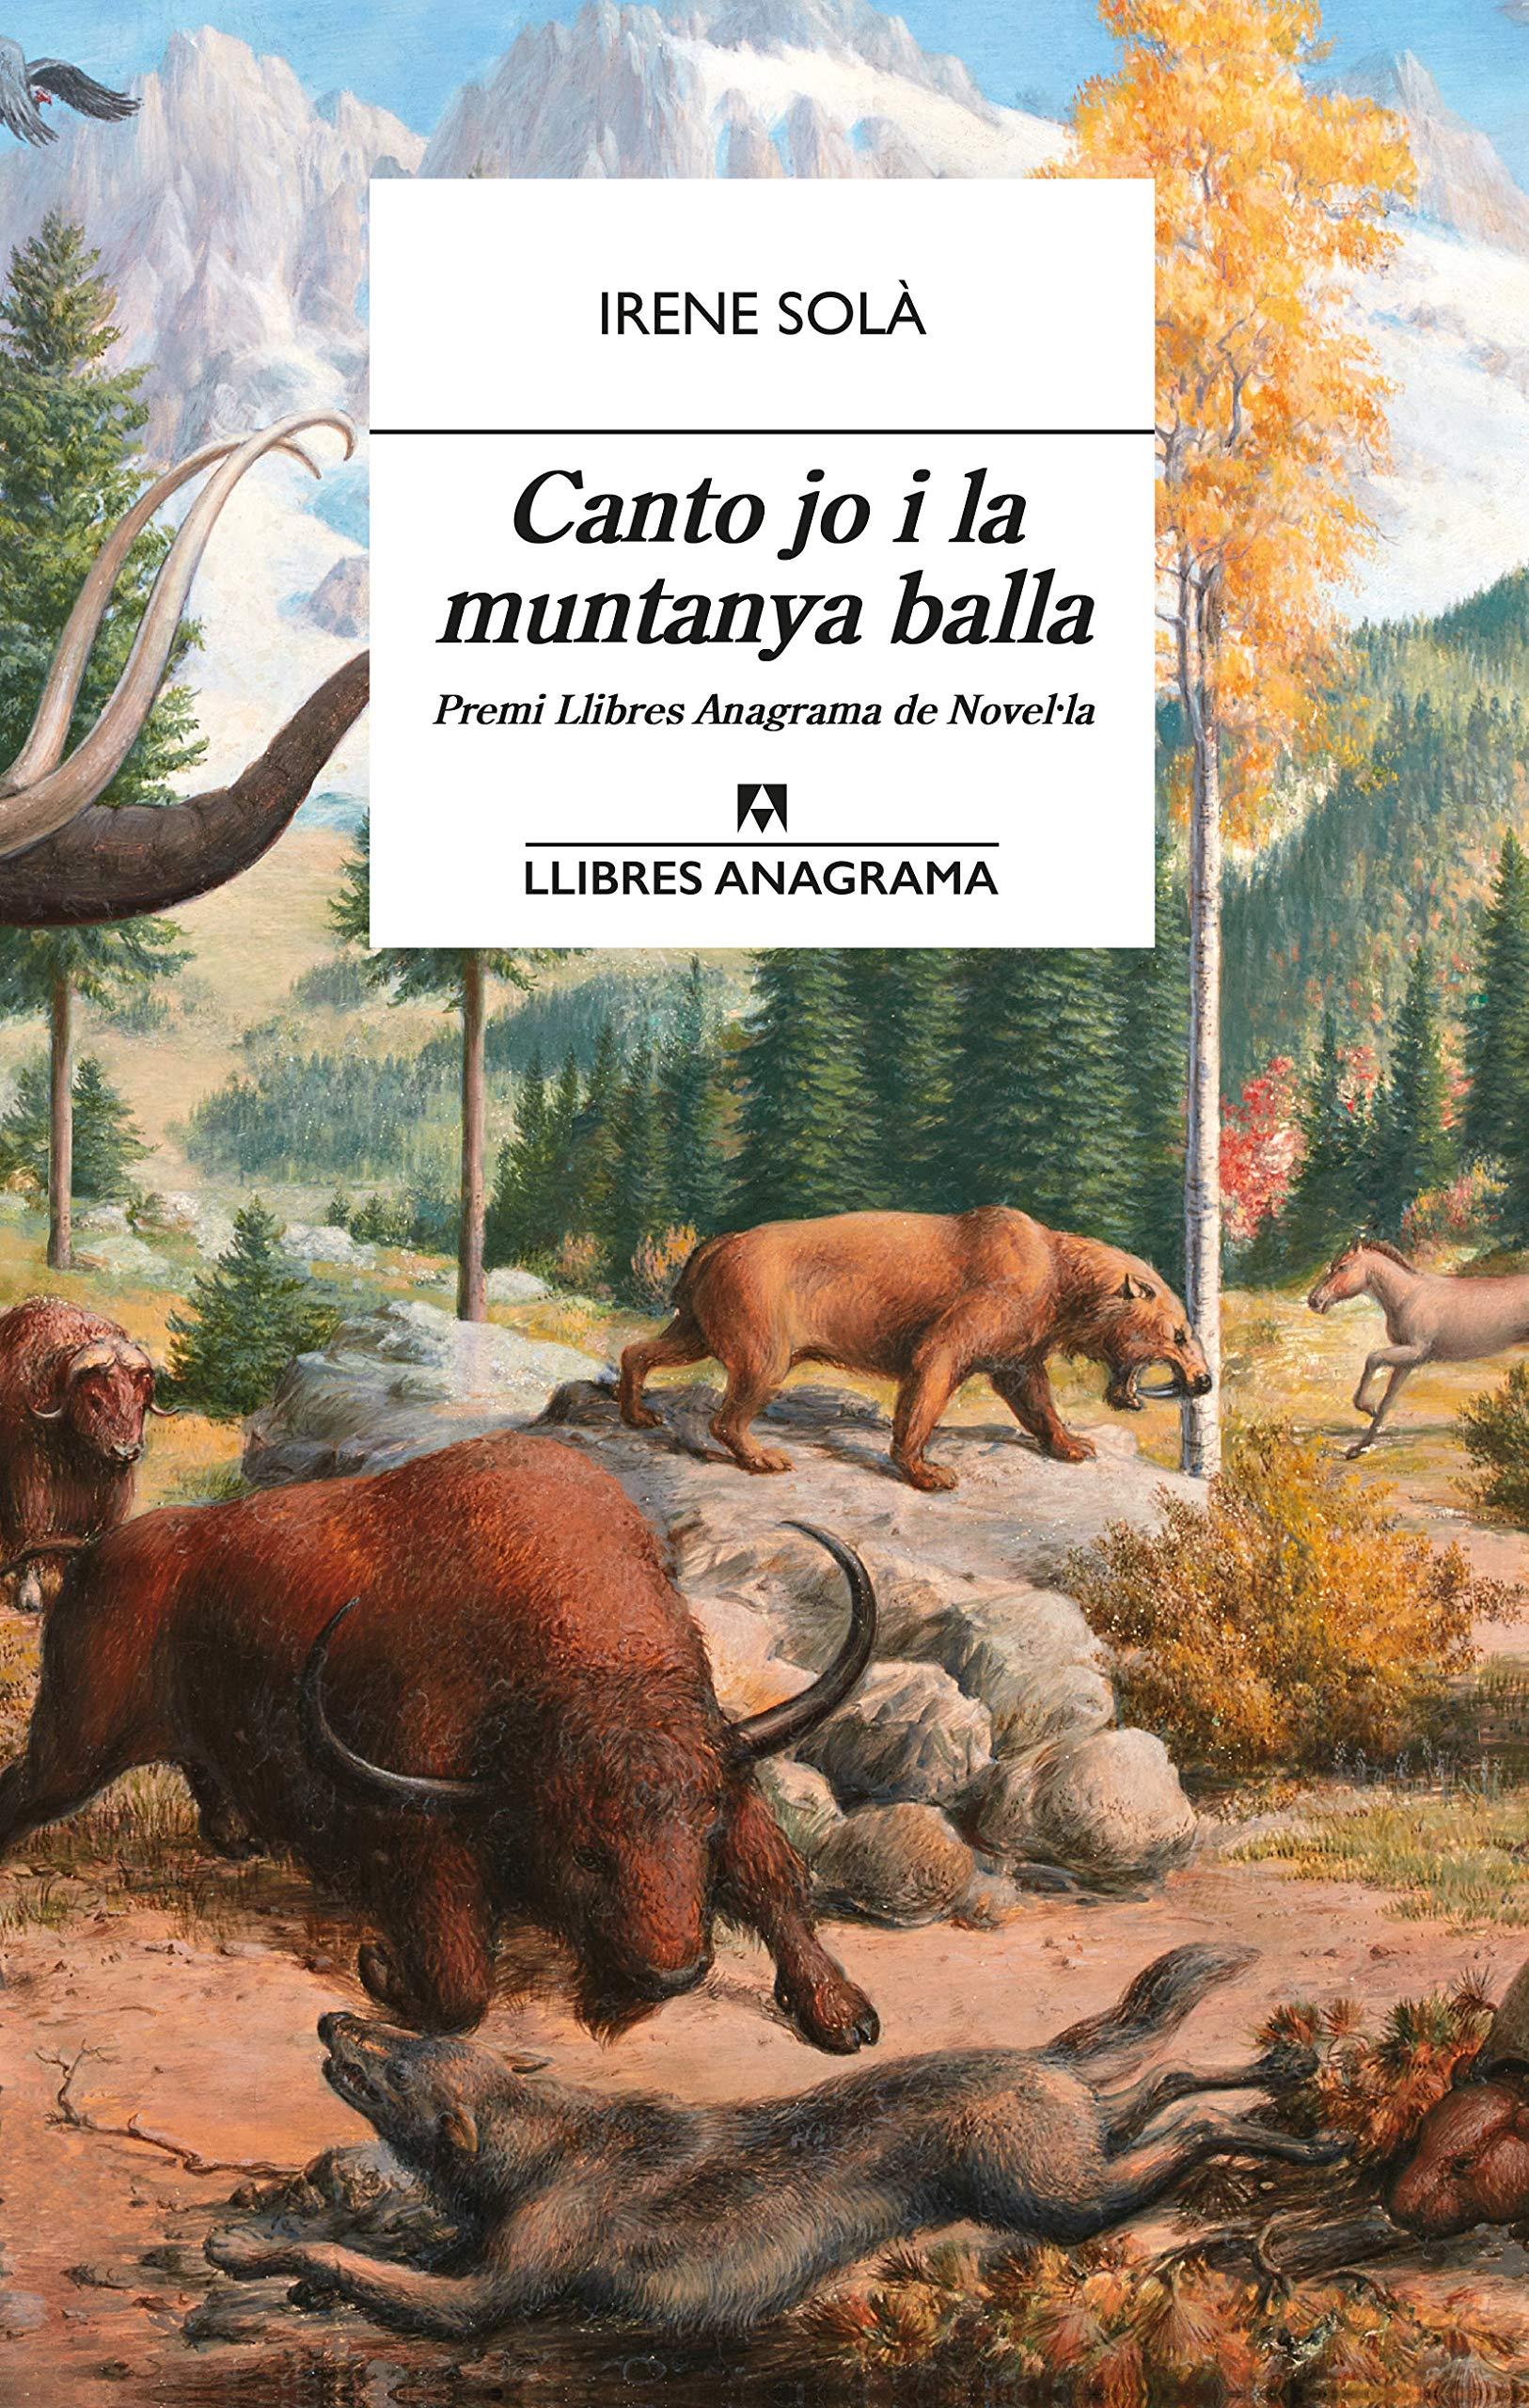 SOLÀ, Irene Canto jo i la muntanya balla